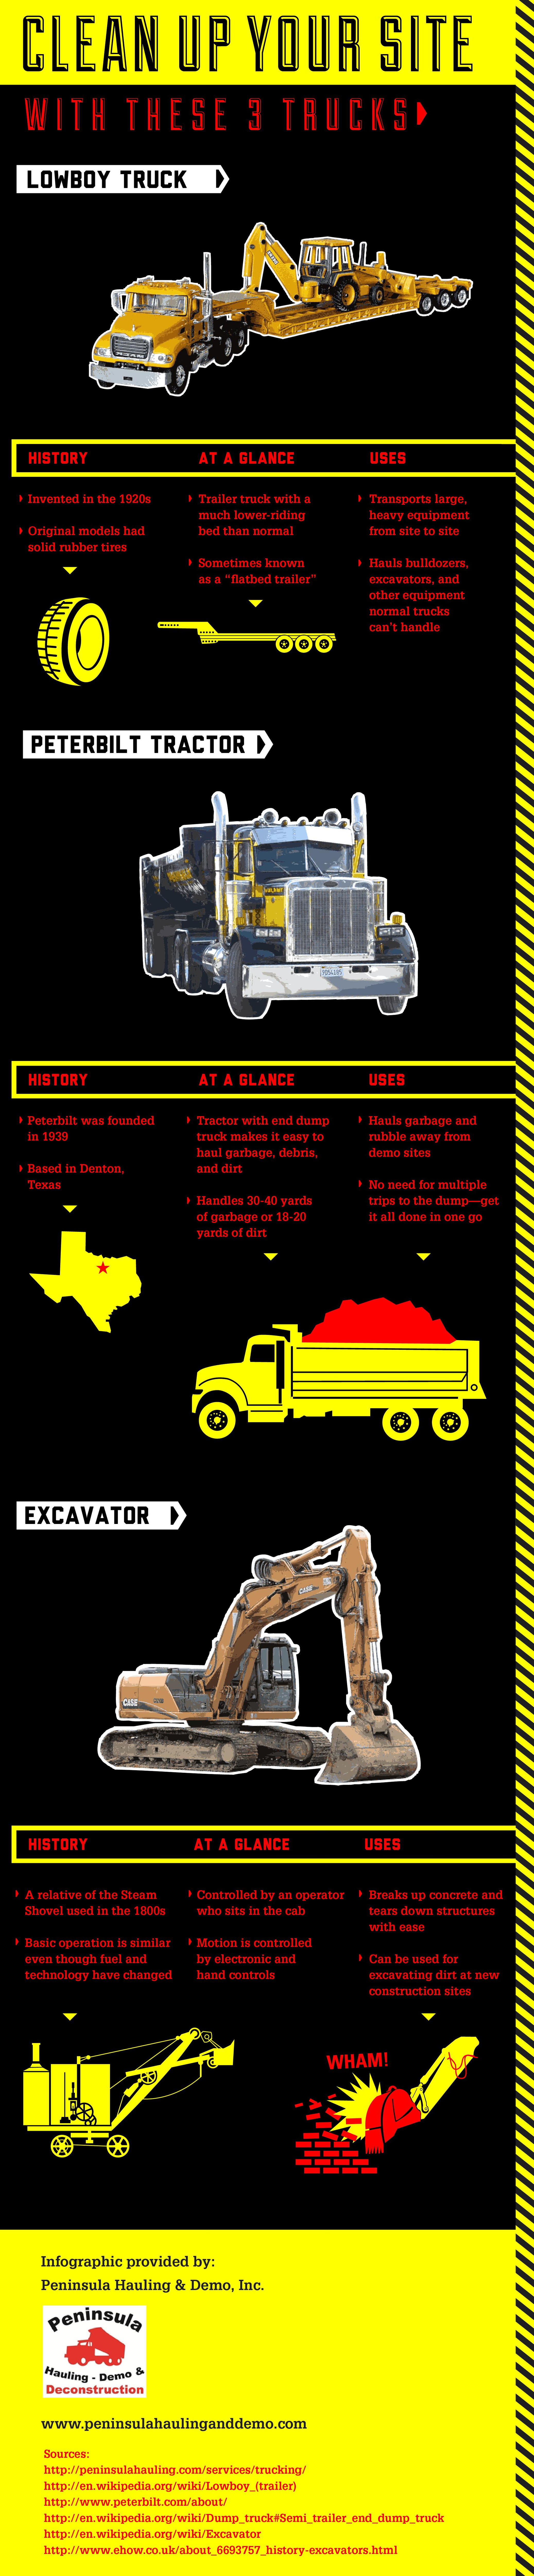 3 trucks infographic